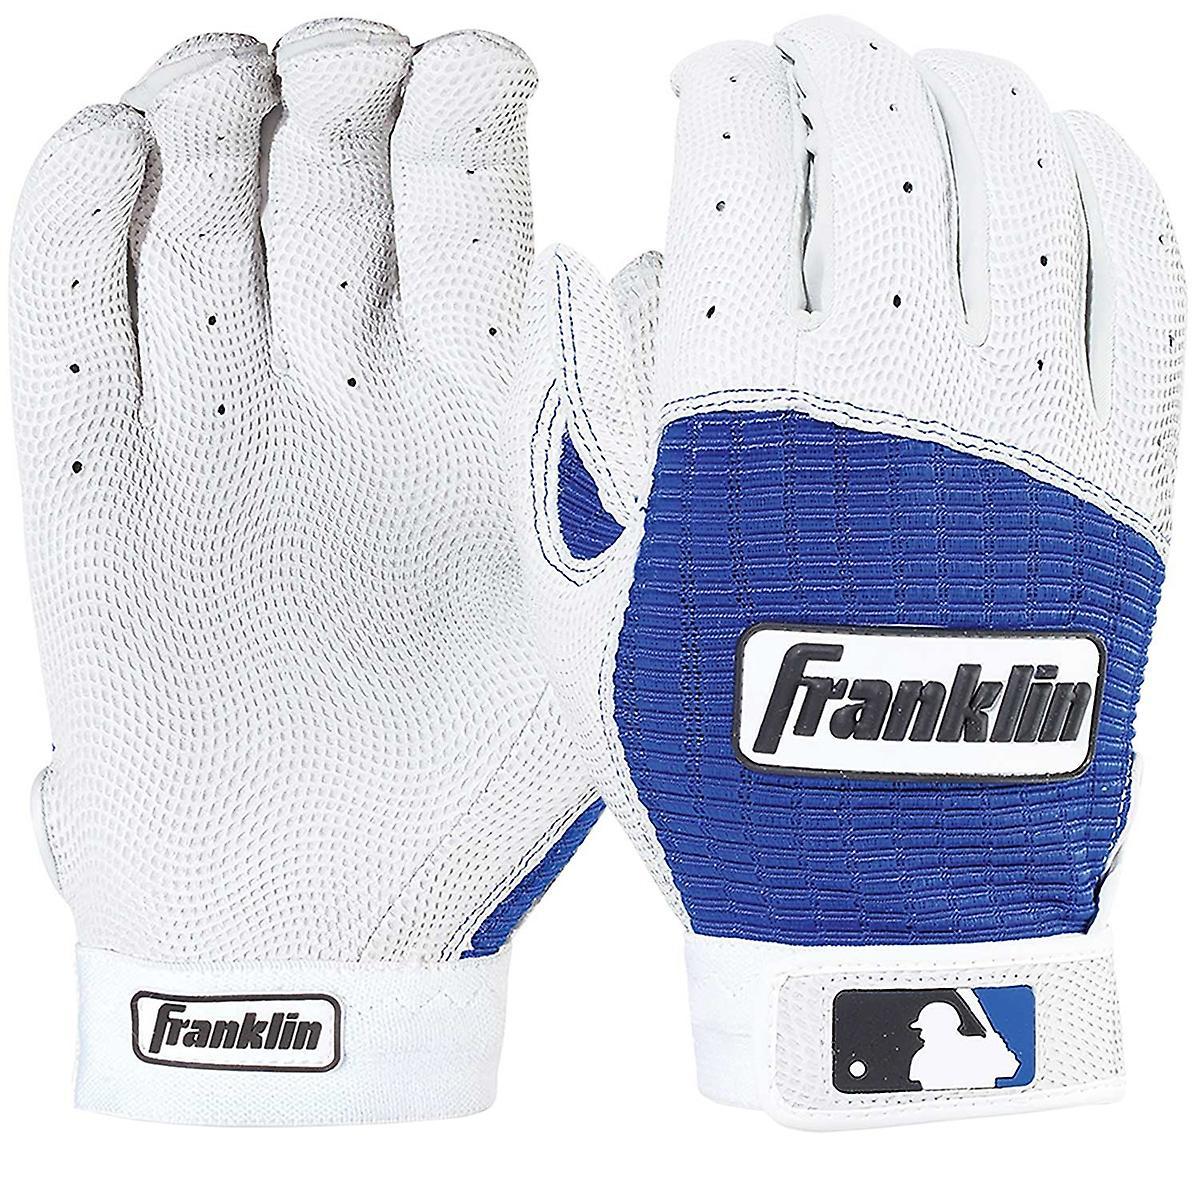 Franklin voksen Pro klassisk MLB Batting hansker - Pearl/Royal